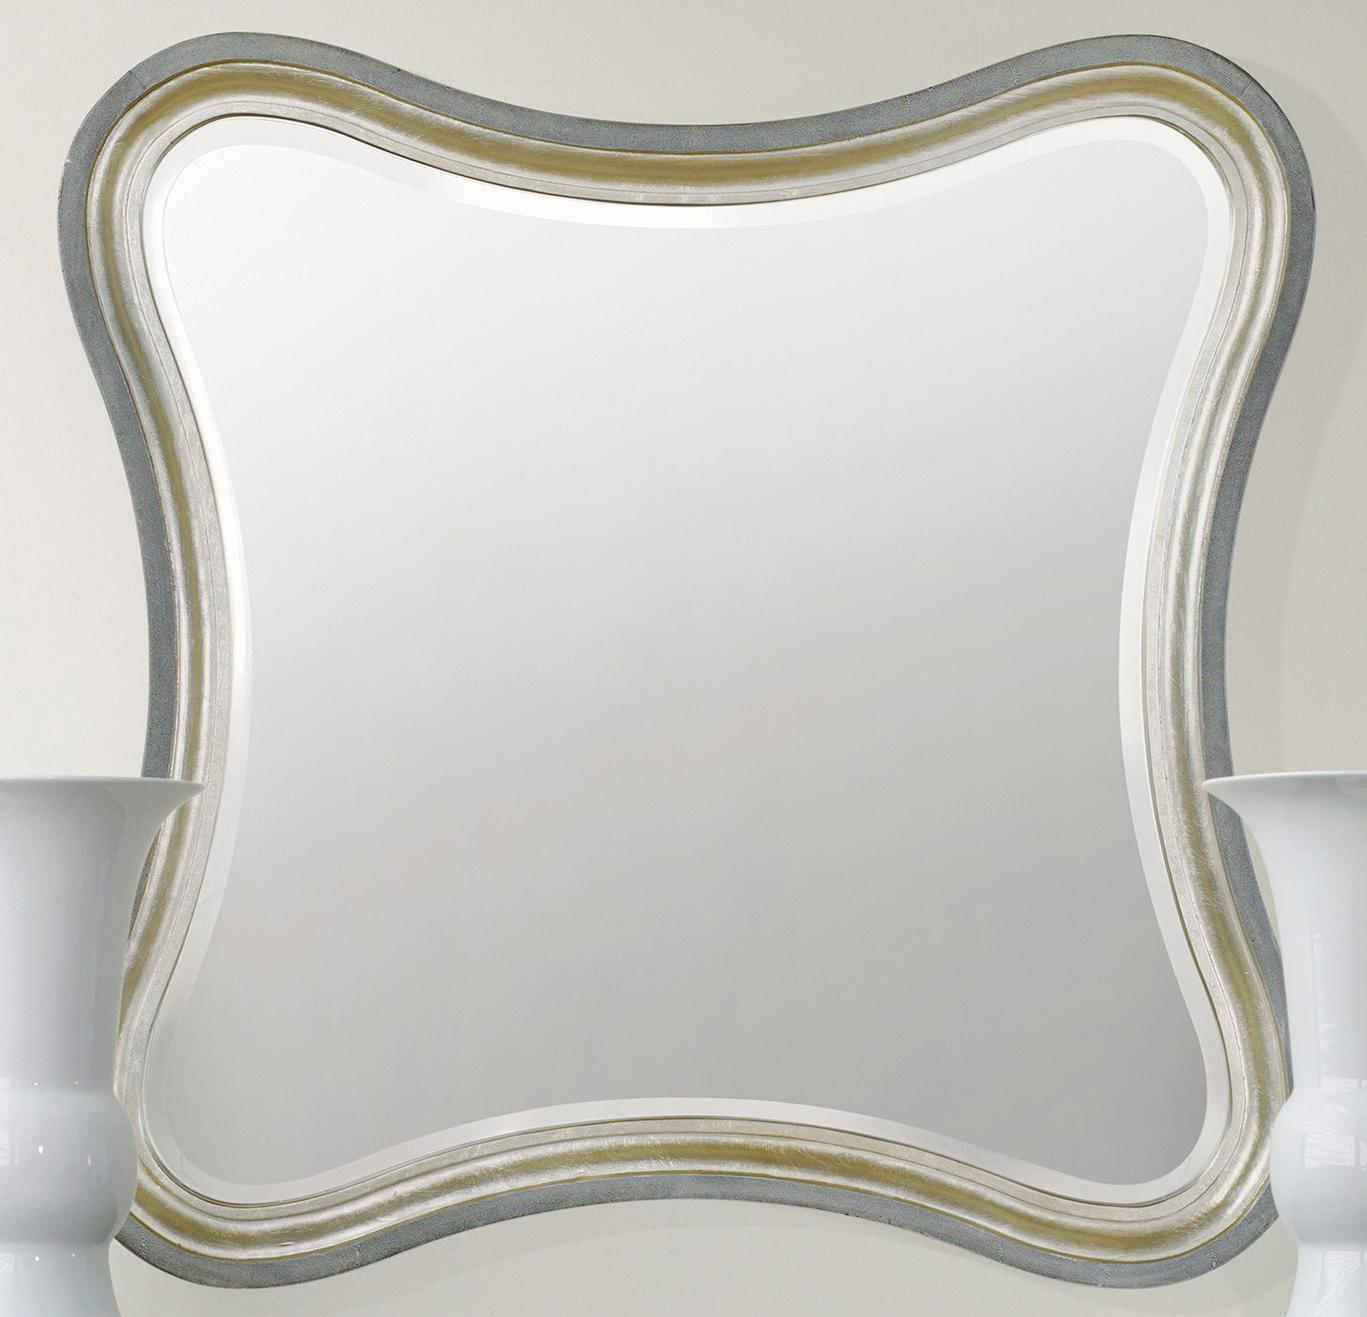 Melange Lana Mirror by Hooker Furniture at Zak's Home